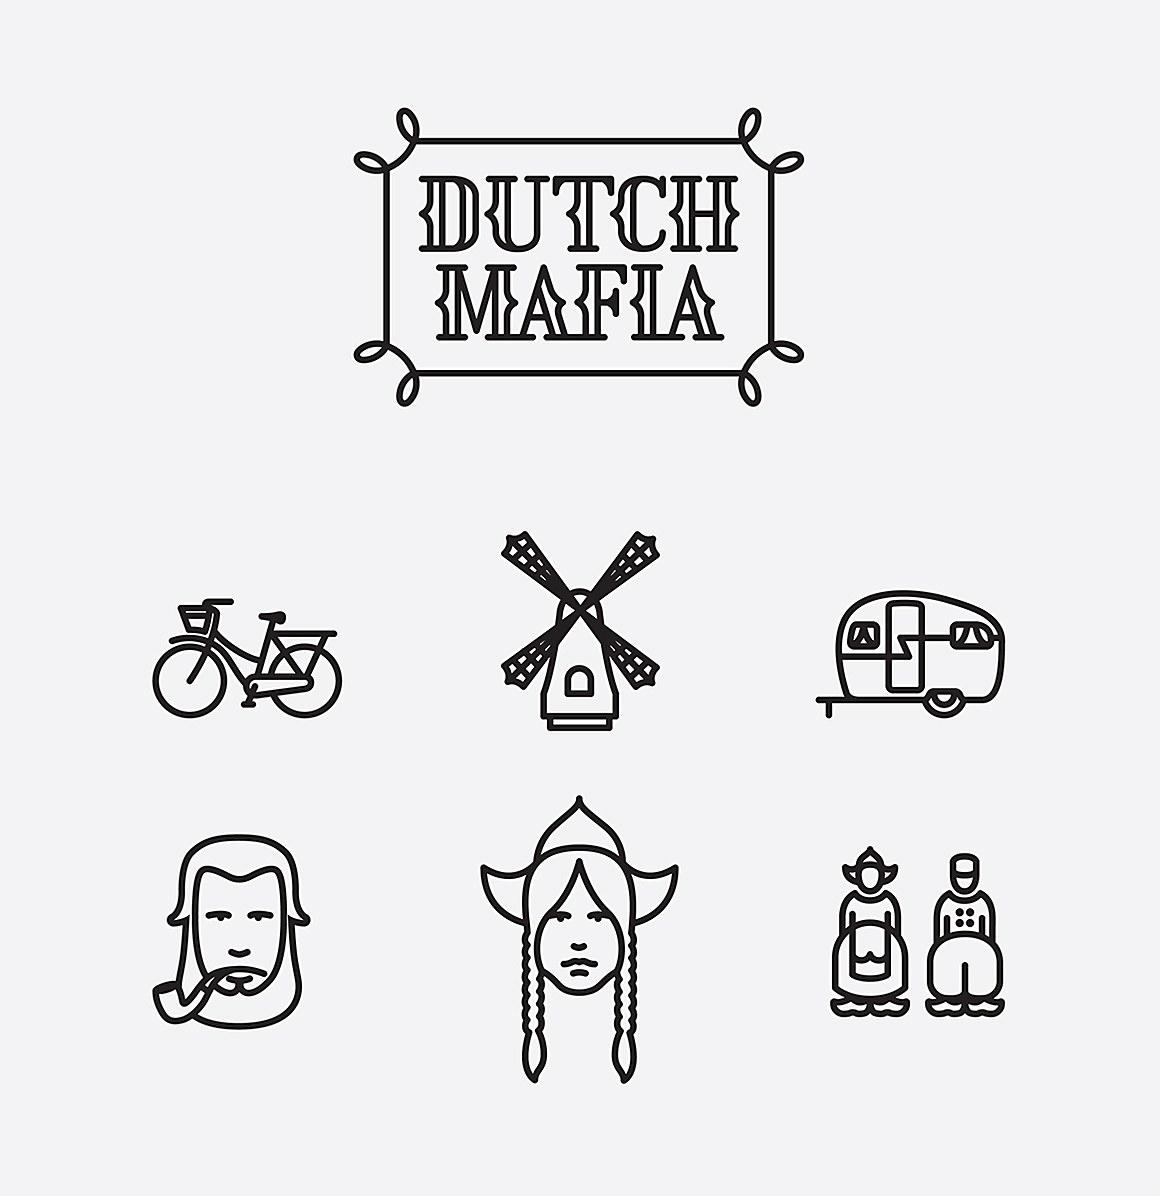 Dutch mafia font and icon set communication arts dutch mafia font and icon set biocorpaavc